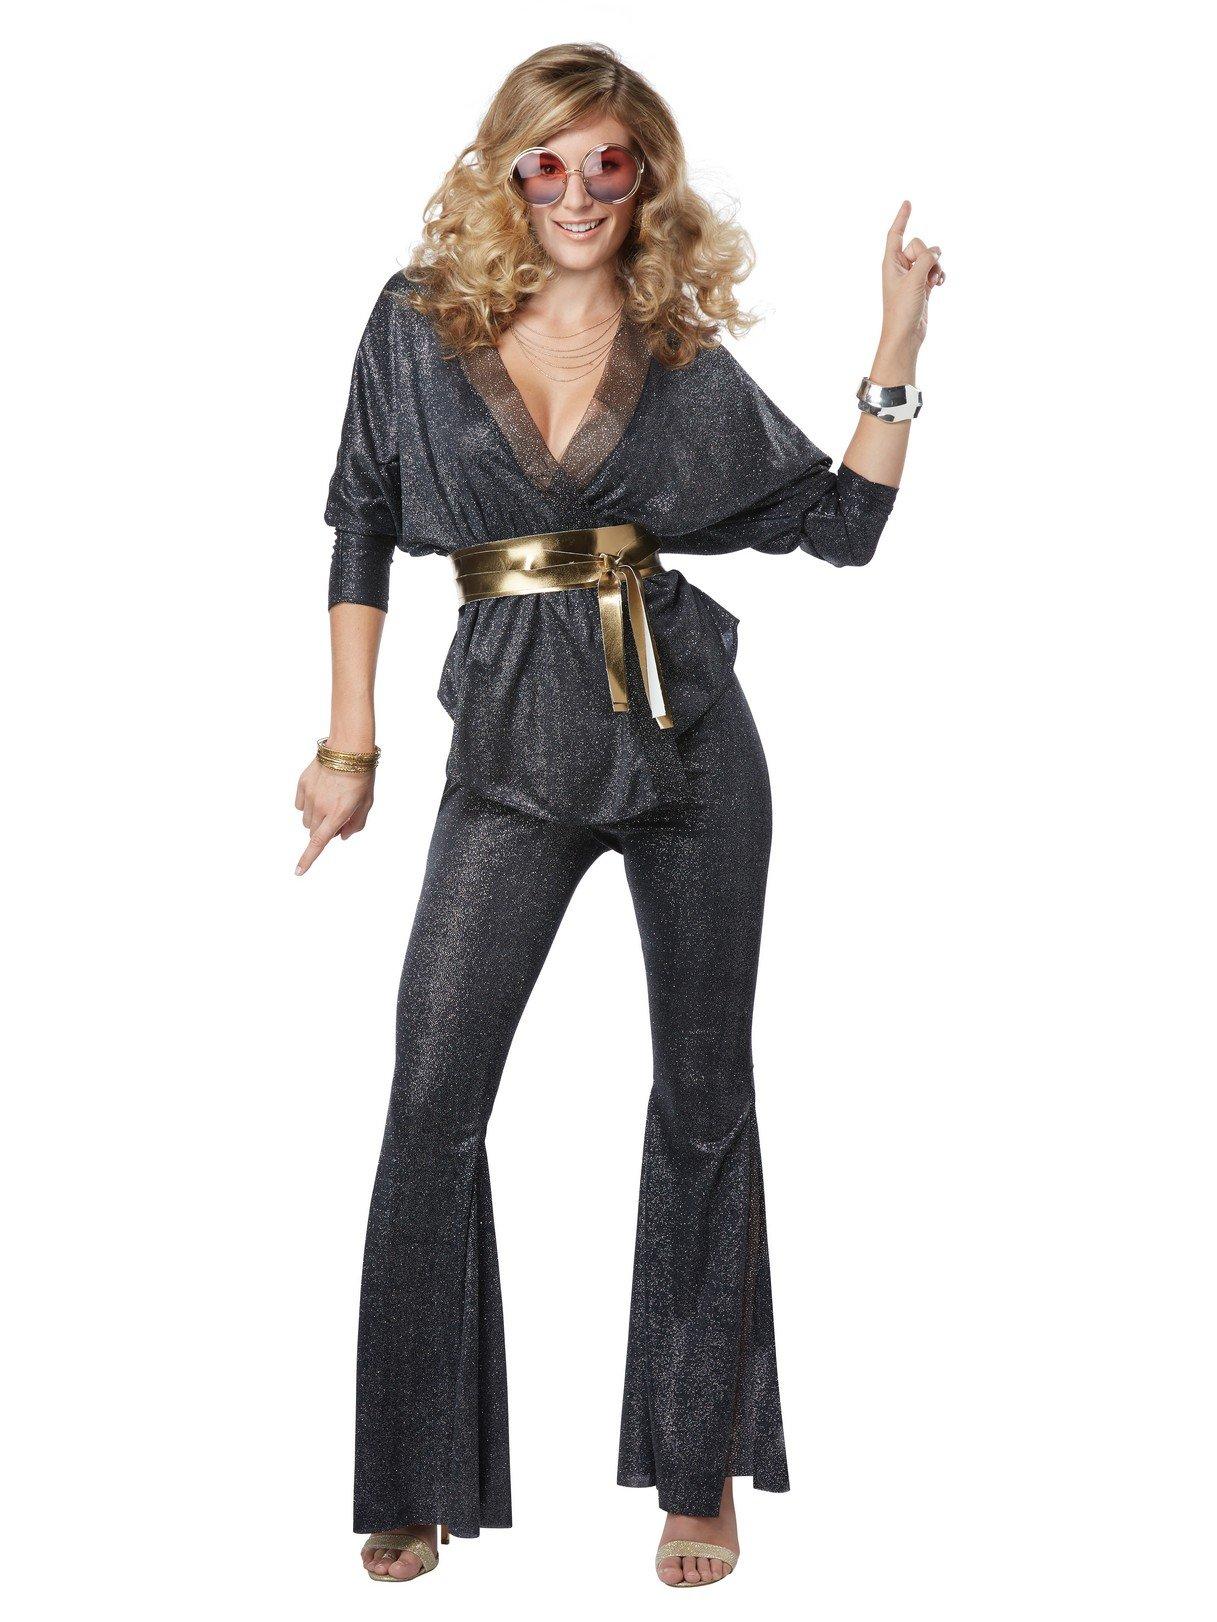 California Costumes Women's Disco Dazzler Adult Woman Costume, Black/Gold, Medium